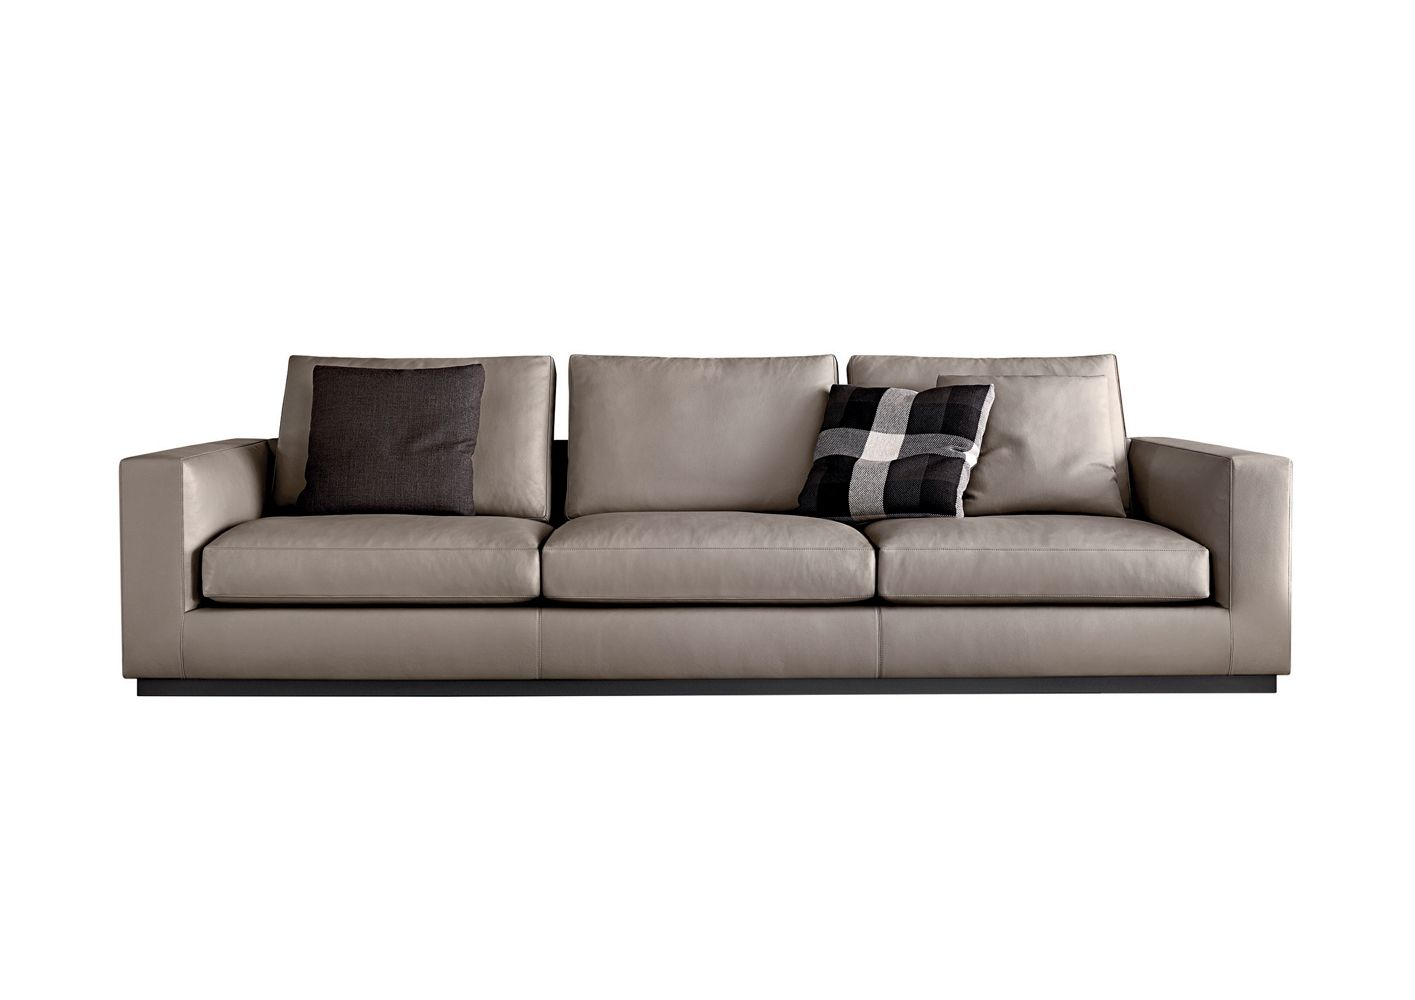 minotti sofas australia florida corner storage sofa bed ipad andersen line quilt